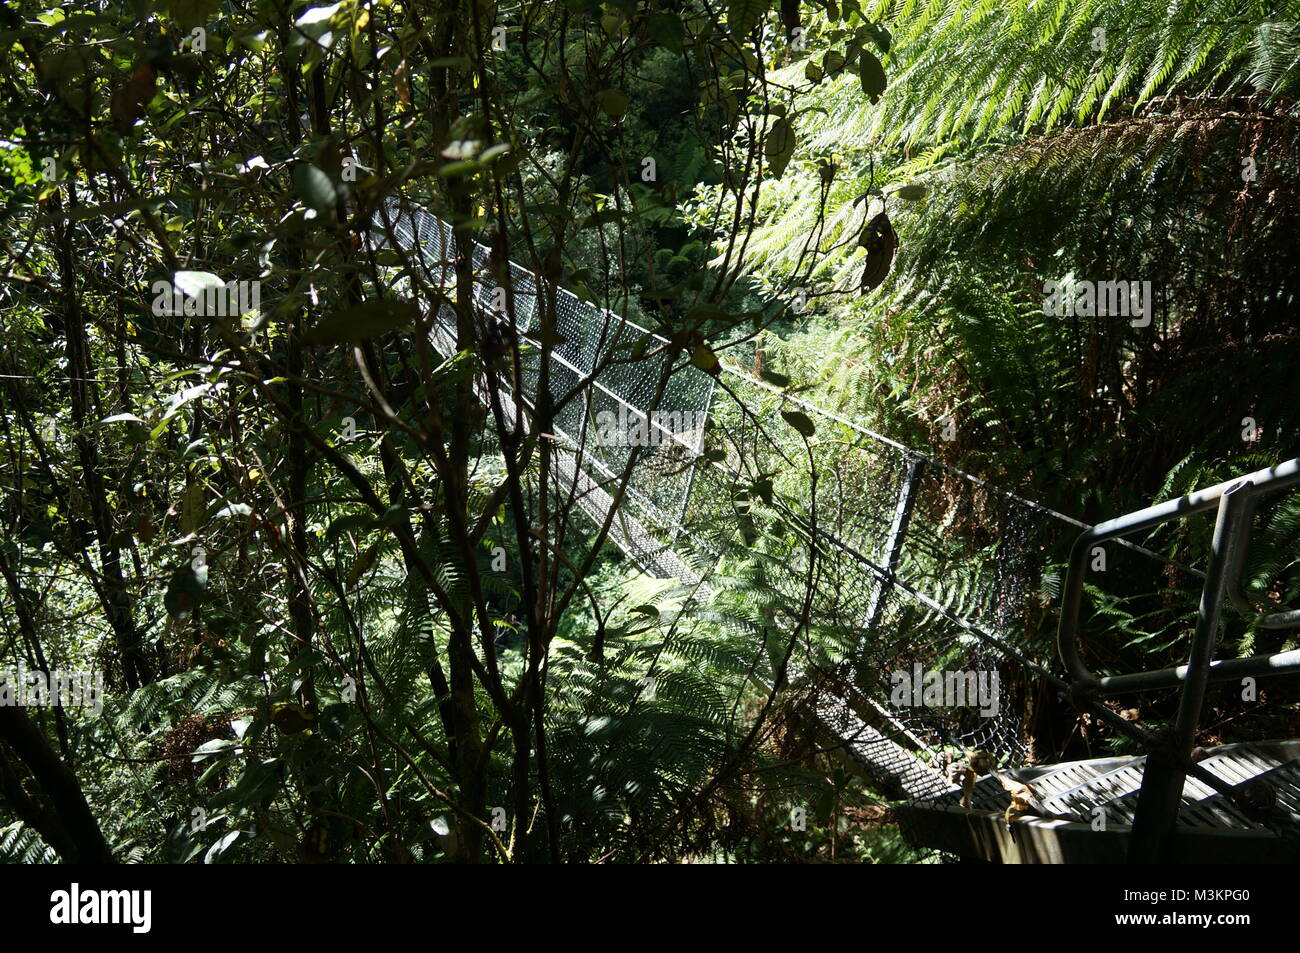 Start of a swinging bridge in the jungle - Stock Image